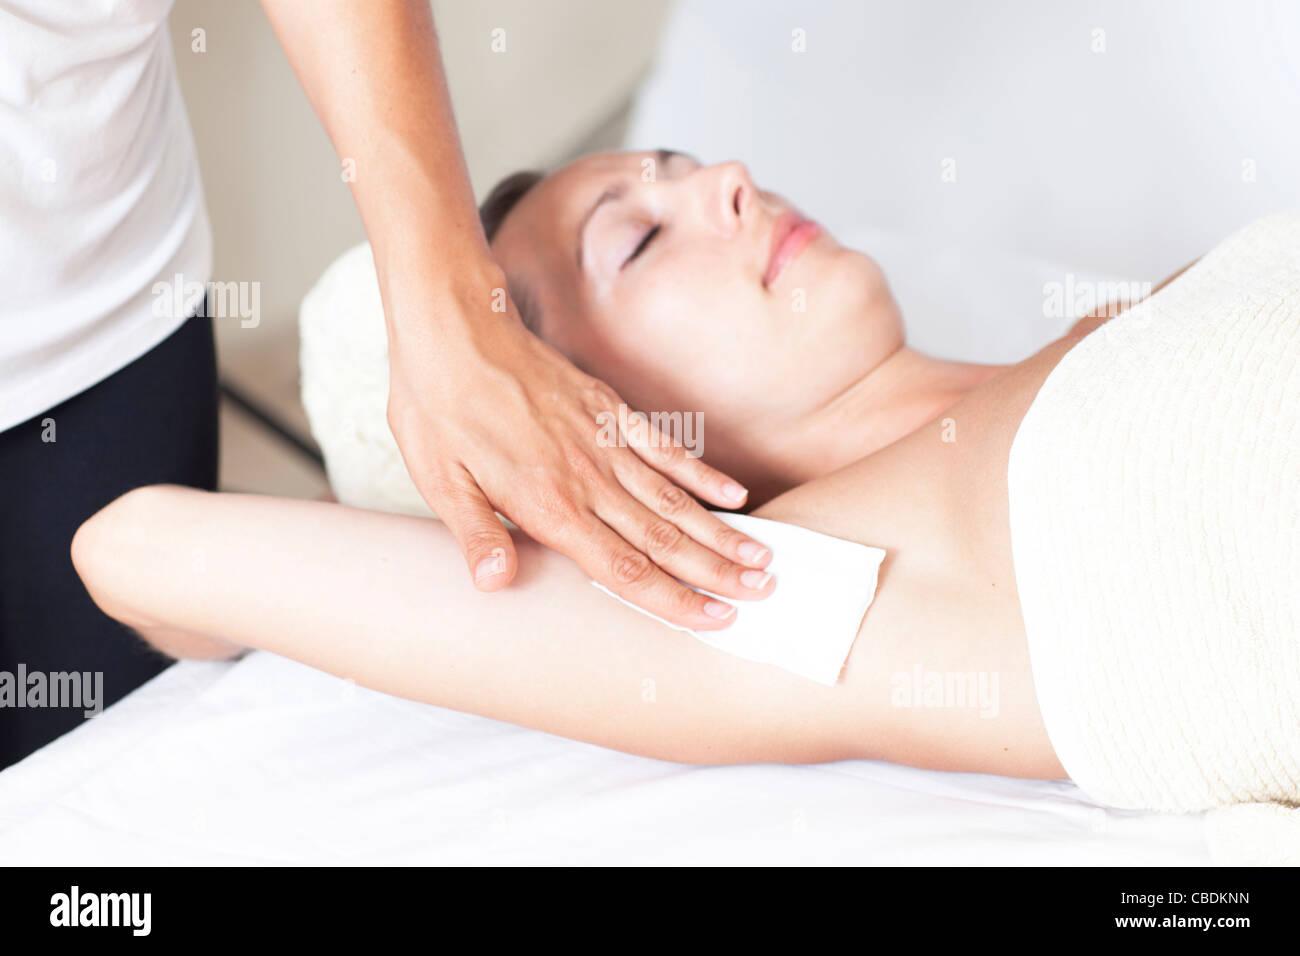 Female armpit depilation in a beauty salon - Stock Image